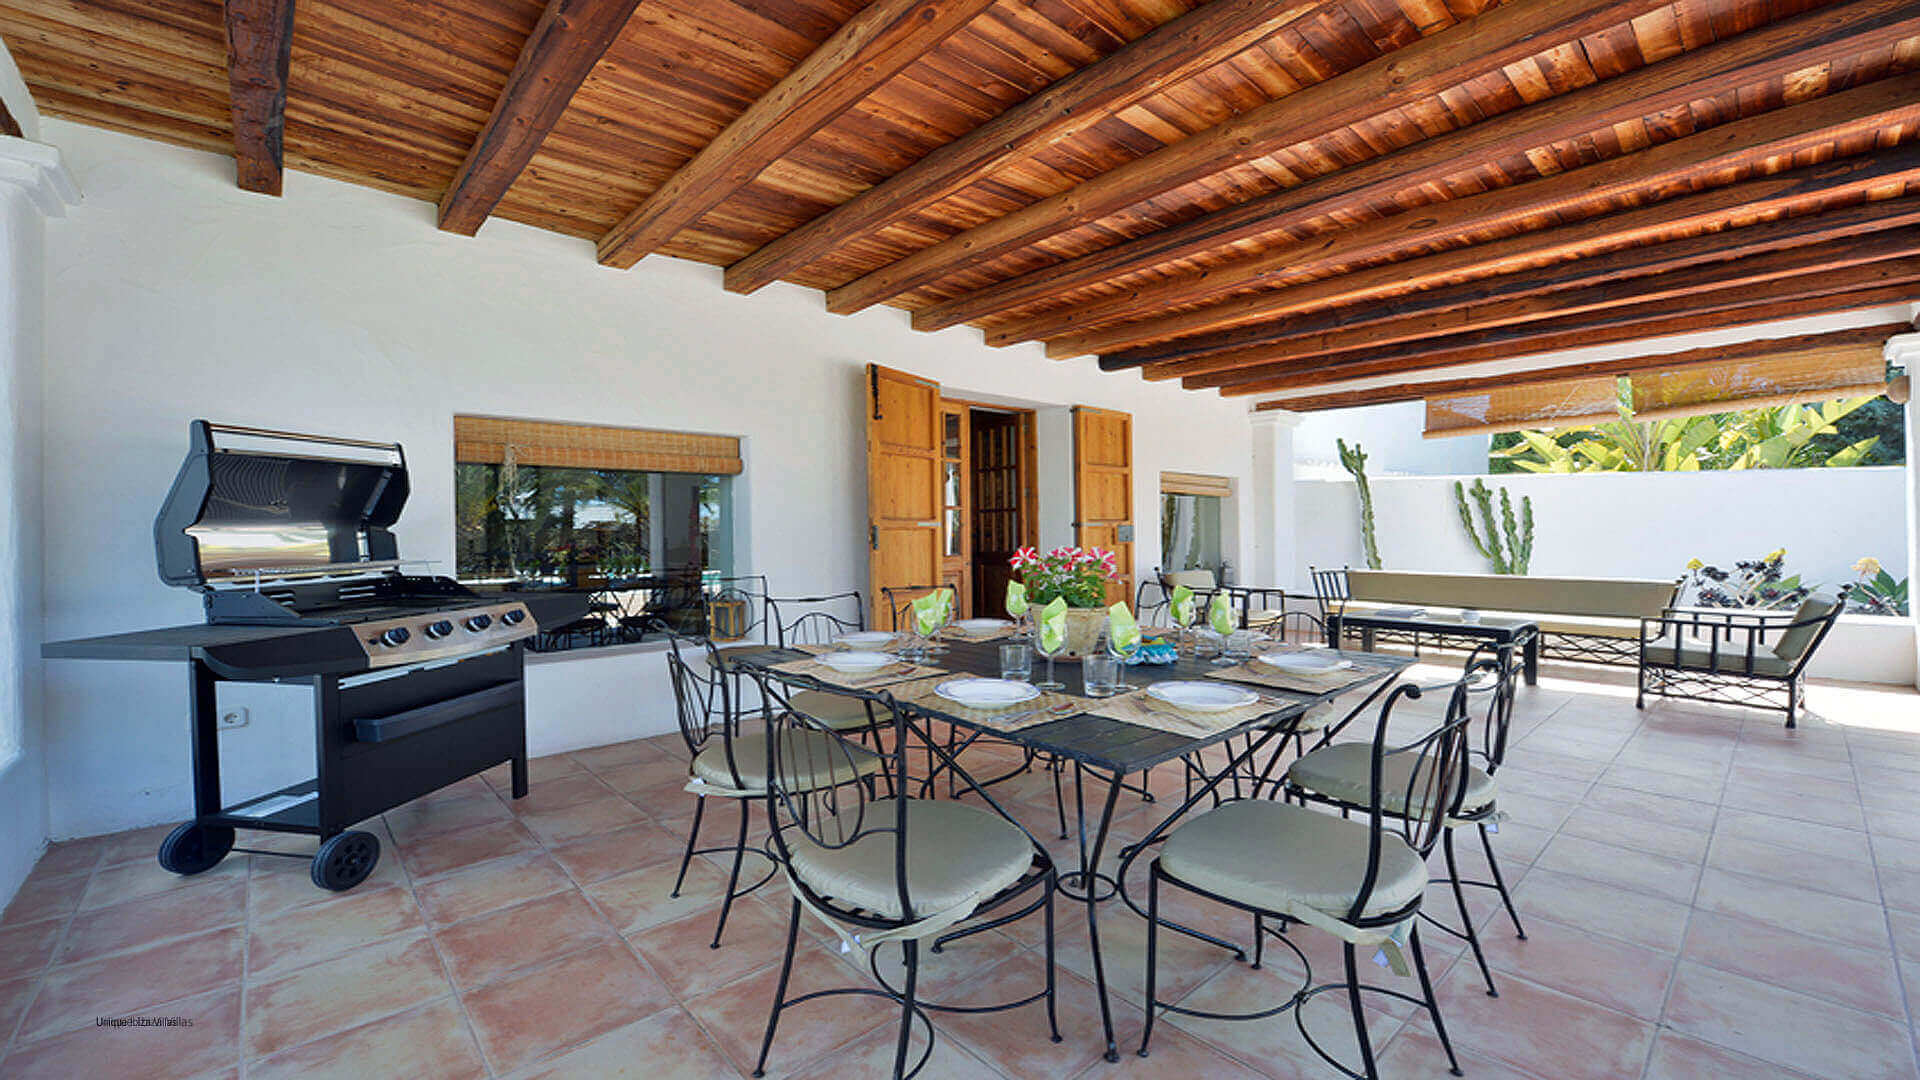 Villa Jaume Dalt Ibiza 7 Playa Den Bossa